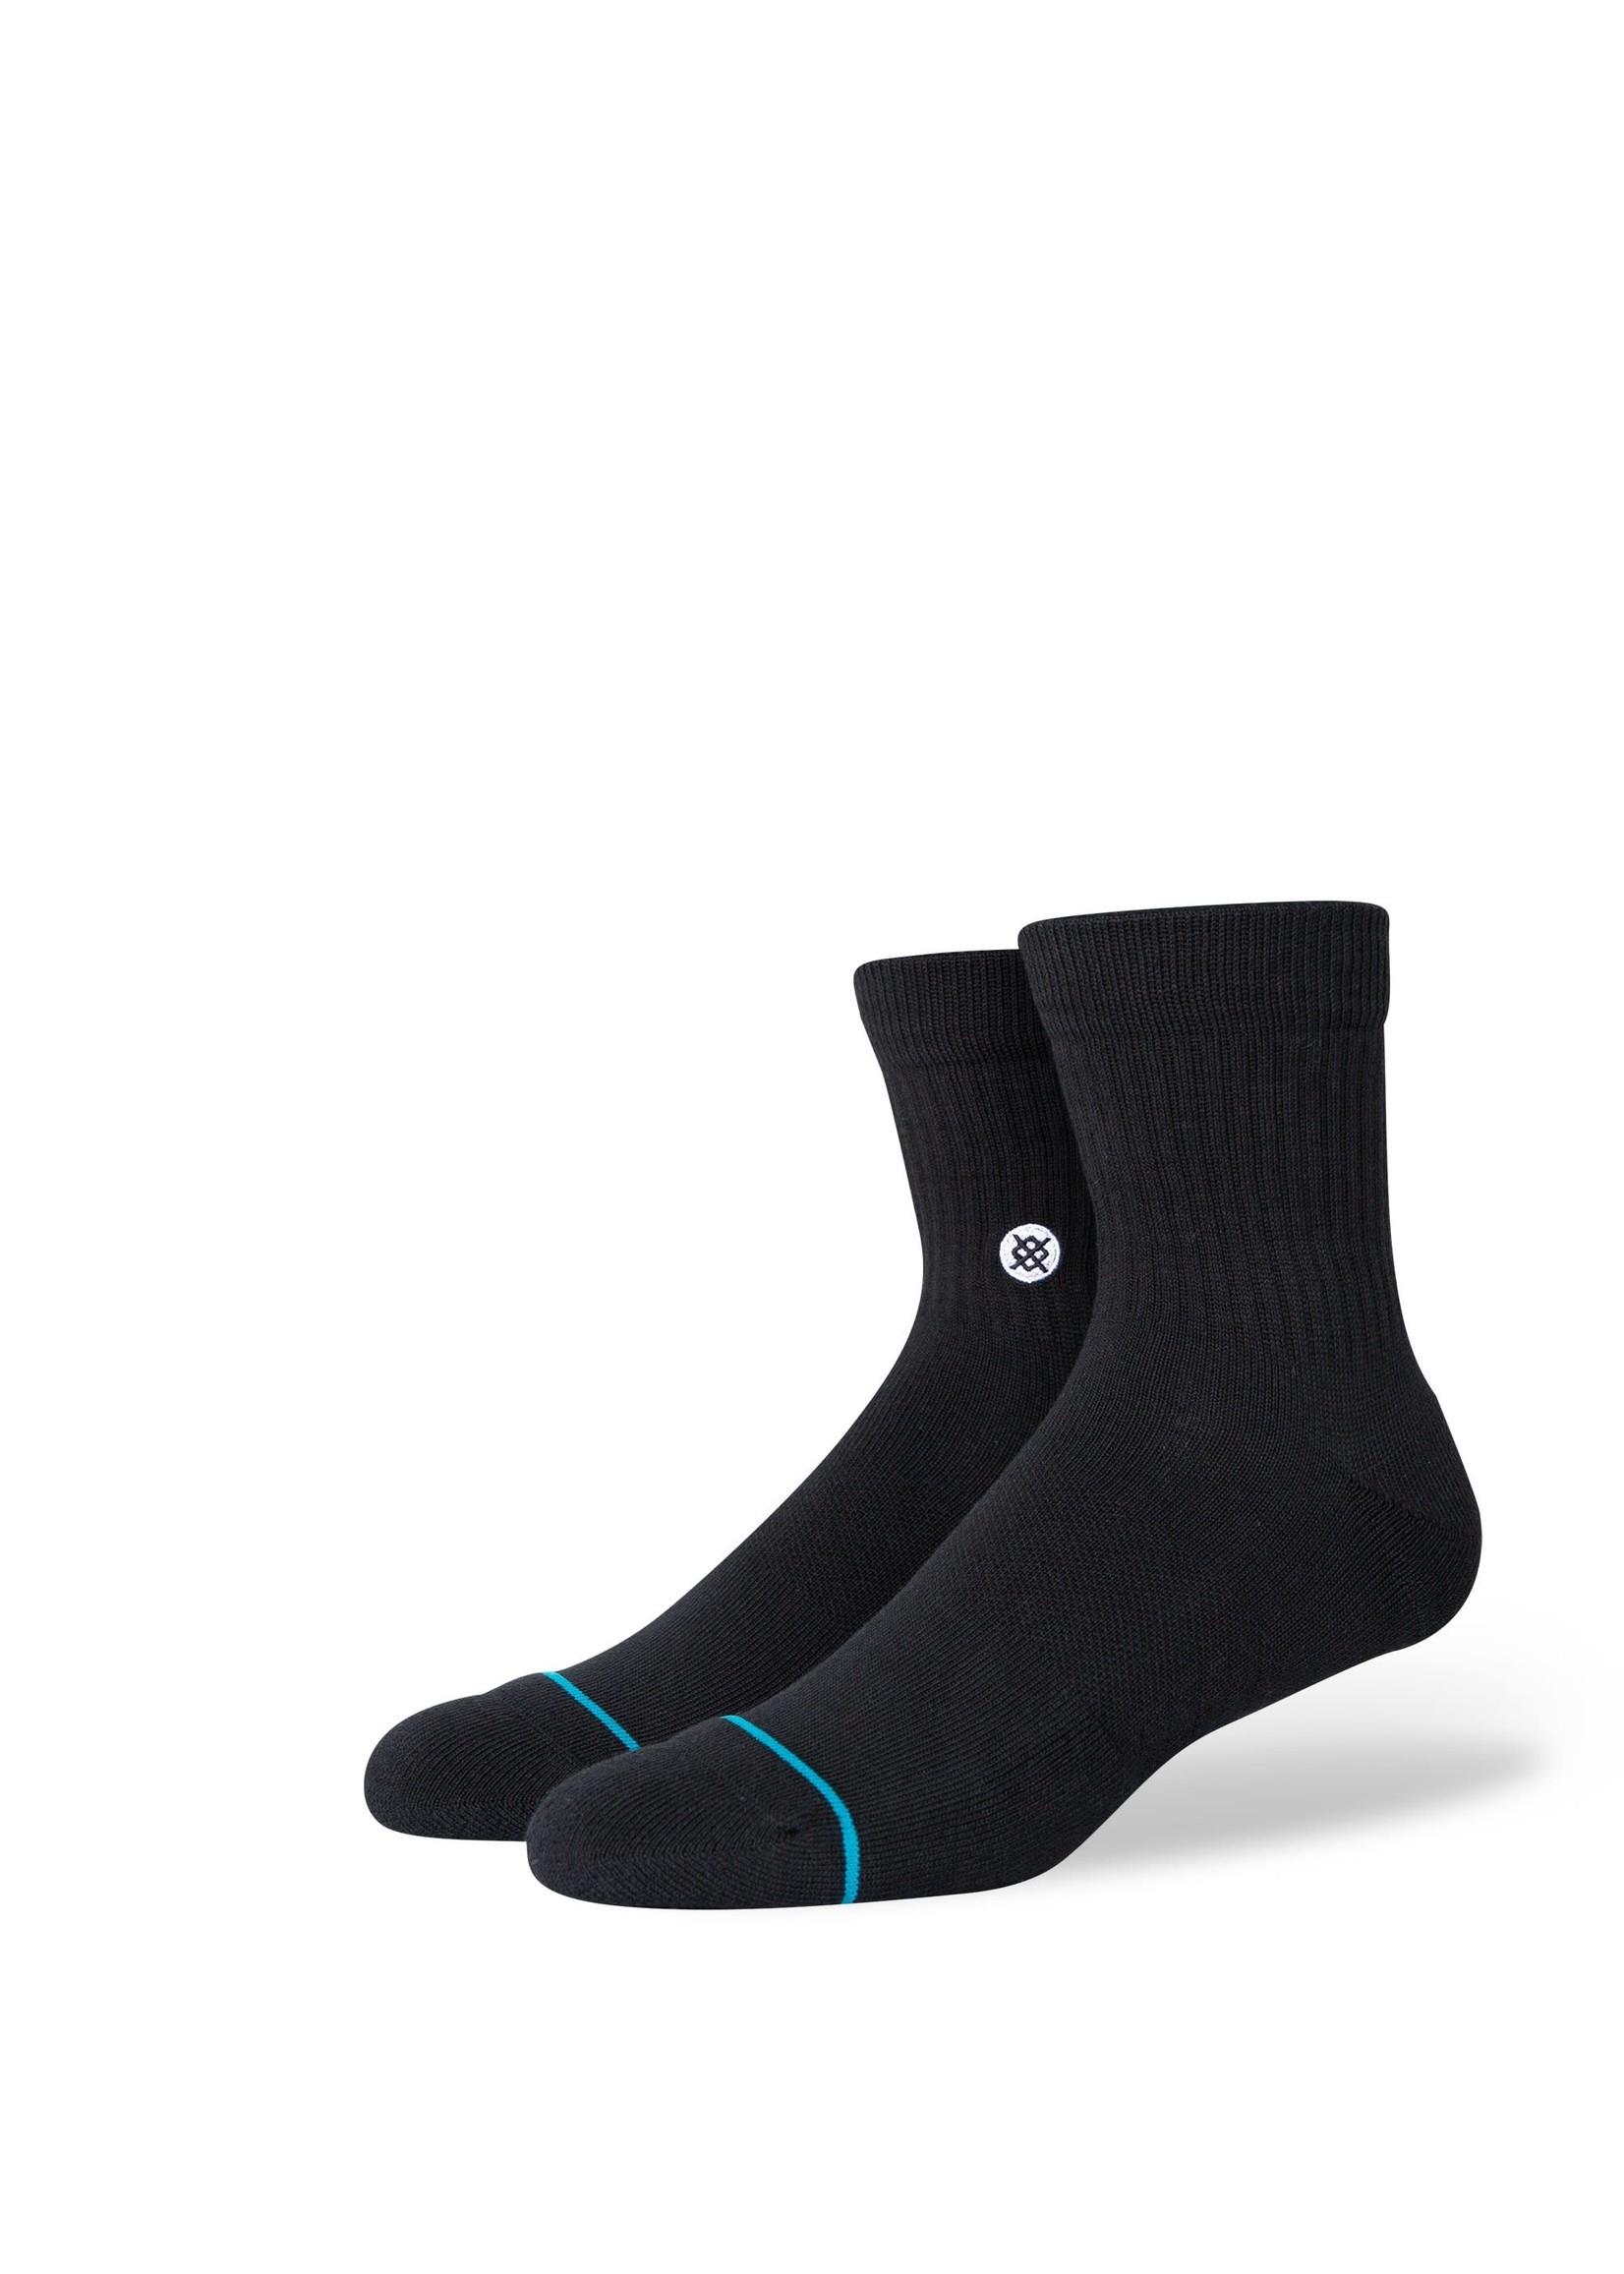 Stance Stance Lowrider Socks